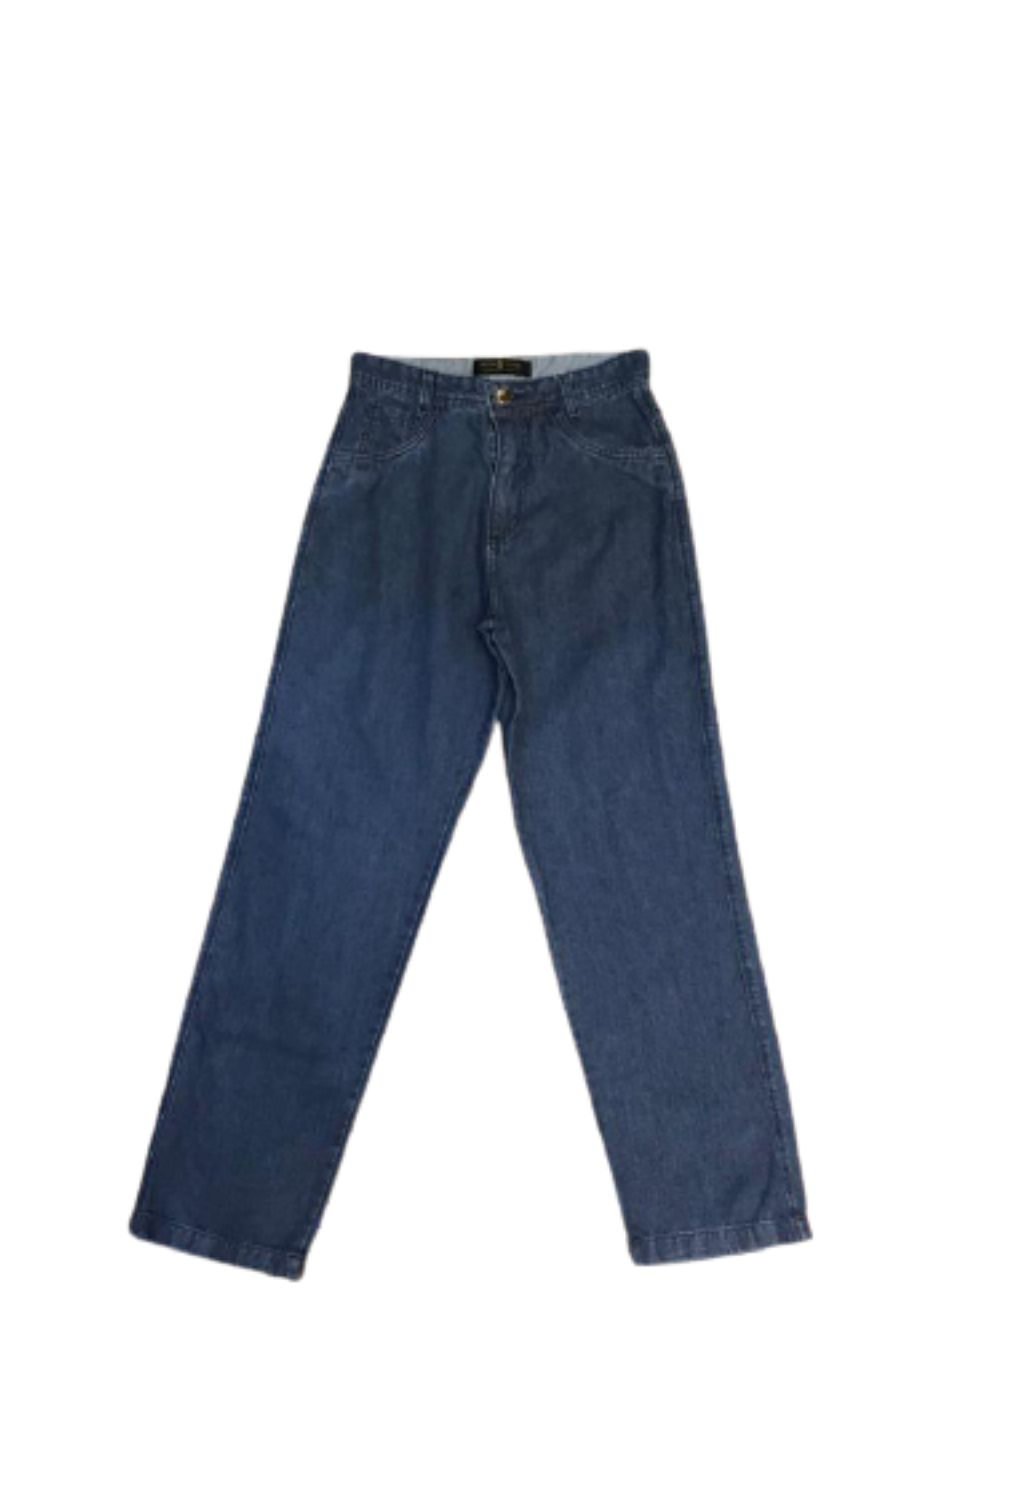 Calça Jeans Feminina Wide Leg  Cintura Alta Tendencia Blogueira  - ModaStore   Moda Feminina